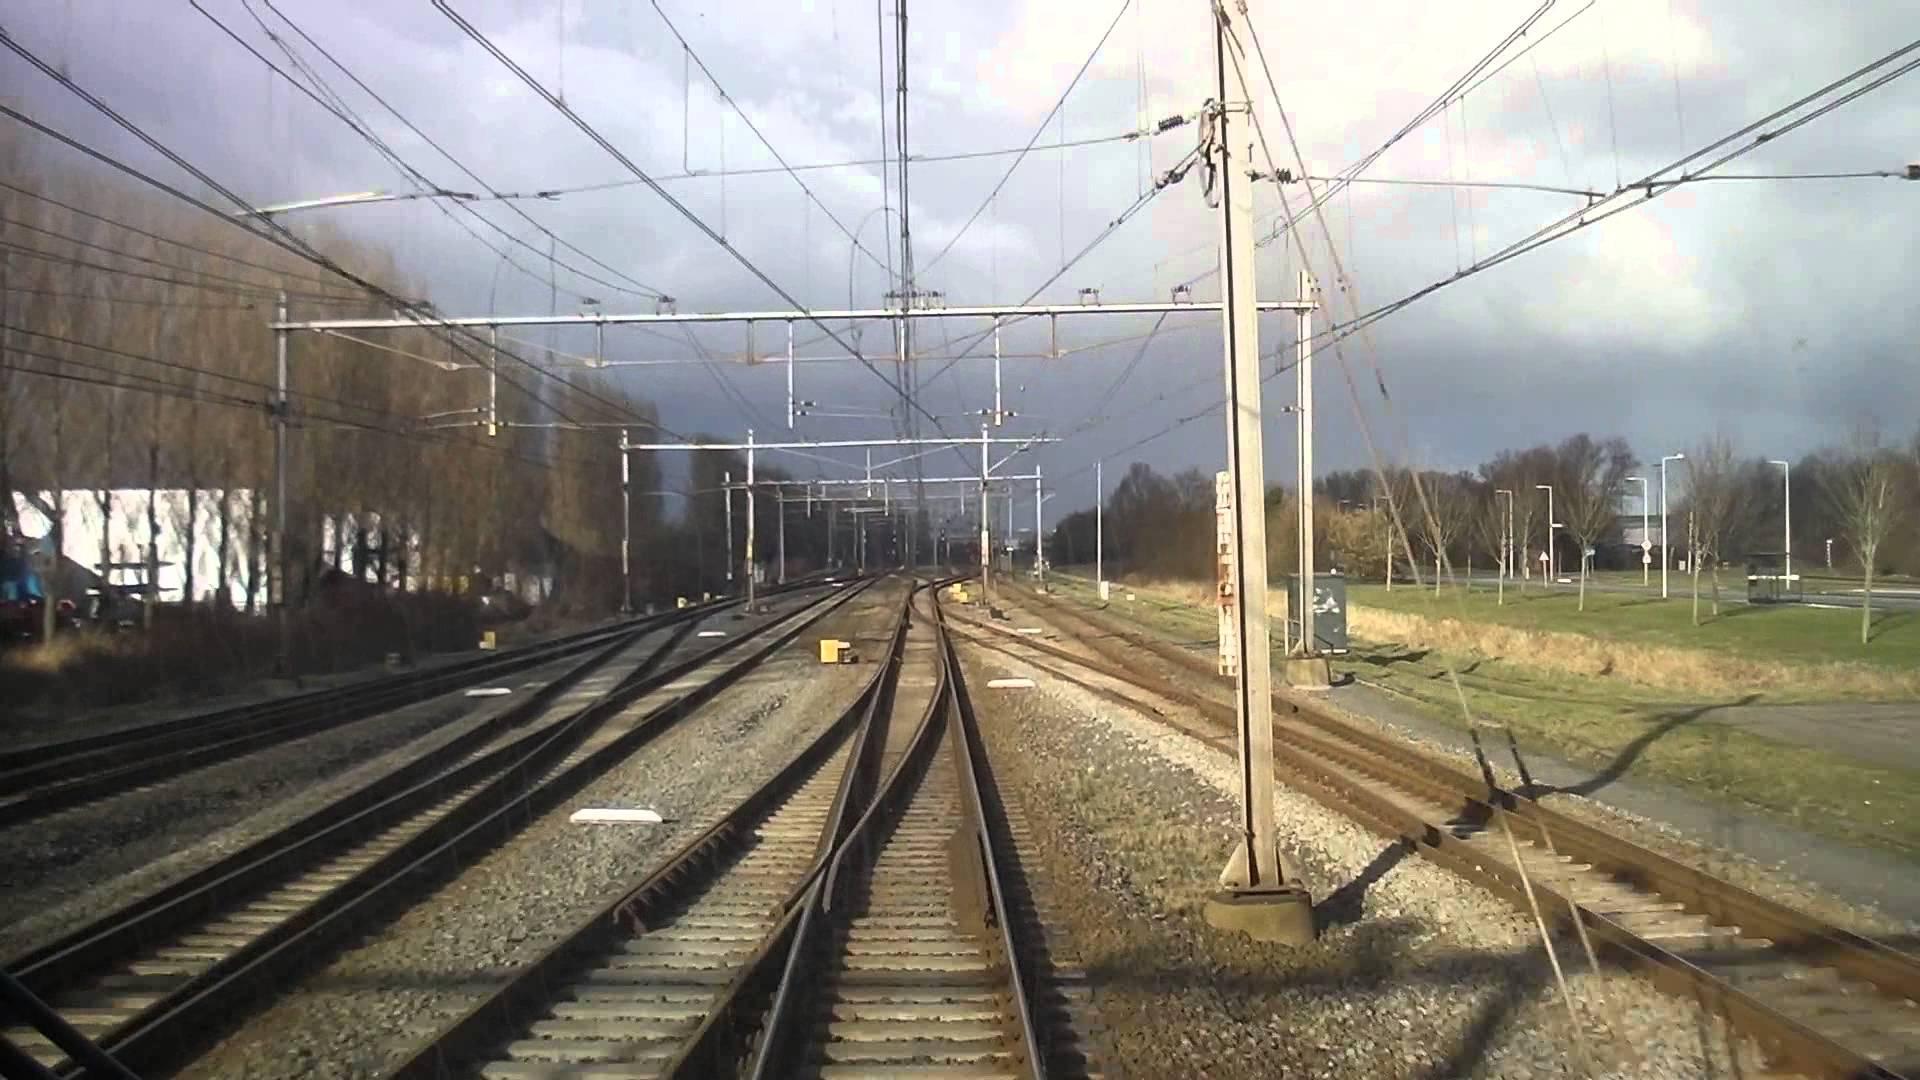 [cabinerit] A train driver's view: Hoofddorp Midden – Hoorn Kersenboogerd, SLT, 03-Feb-2015.